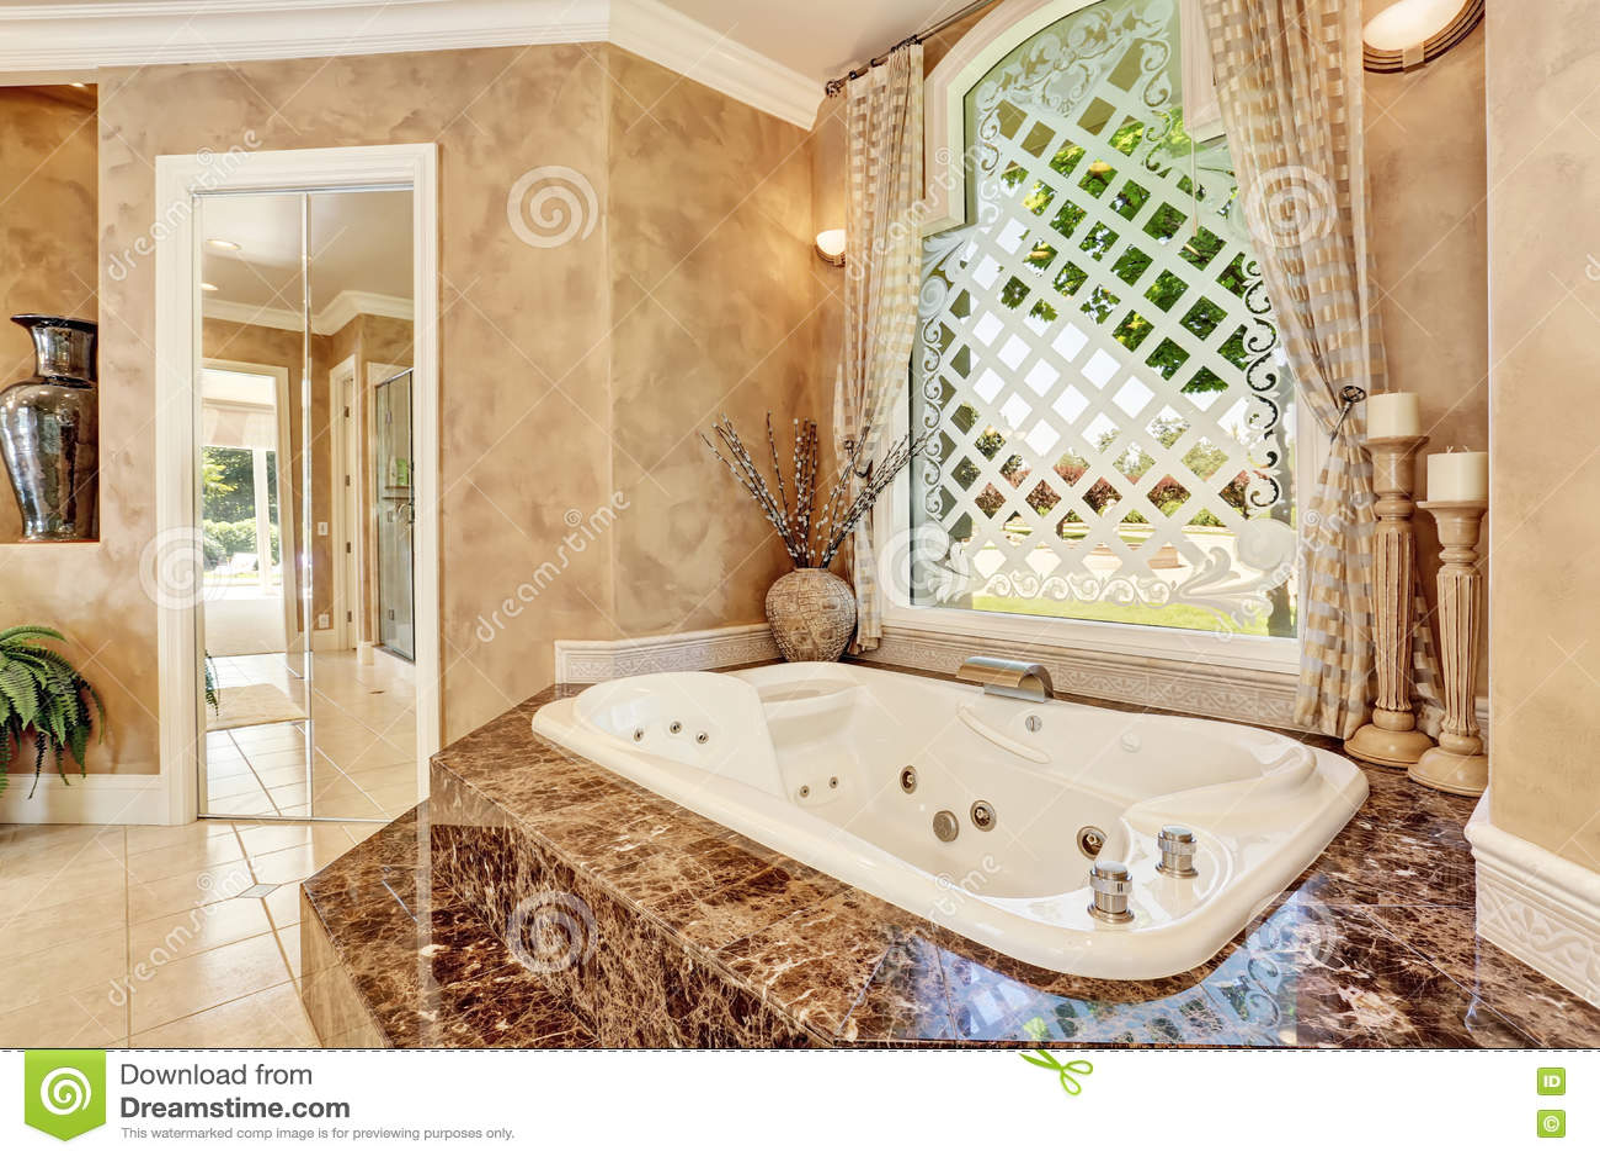 Beautiful Luxury Bathroom Interiors nice luxury bathroom interiors intended bathroom awesome luxurious ideas gallery Beautiful Luxury Marble Bathroom Interior In Beige Color